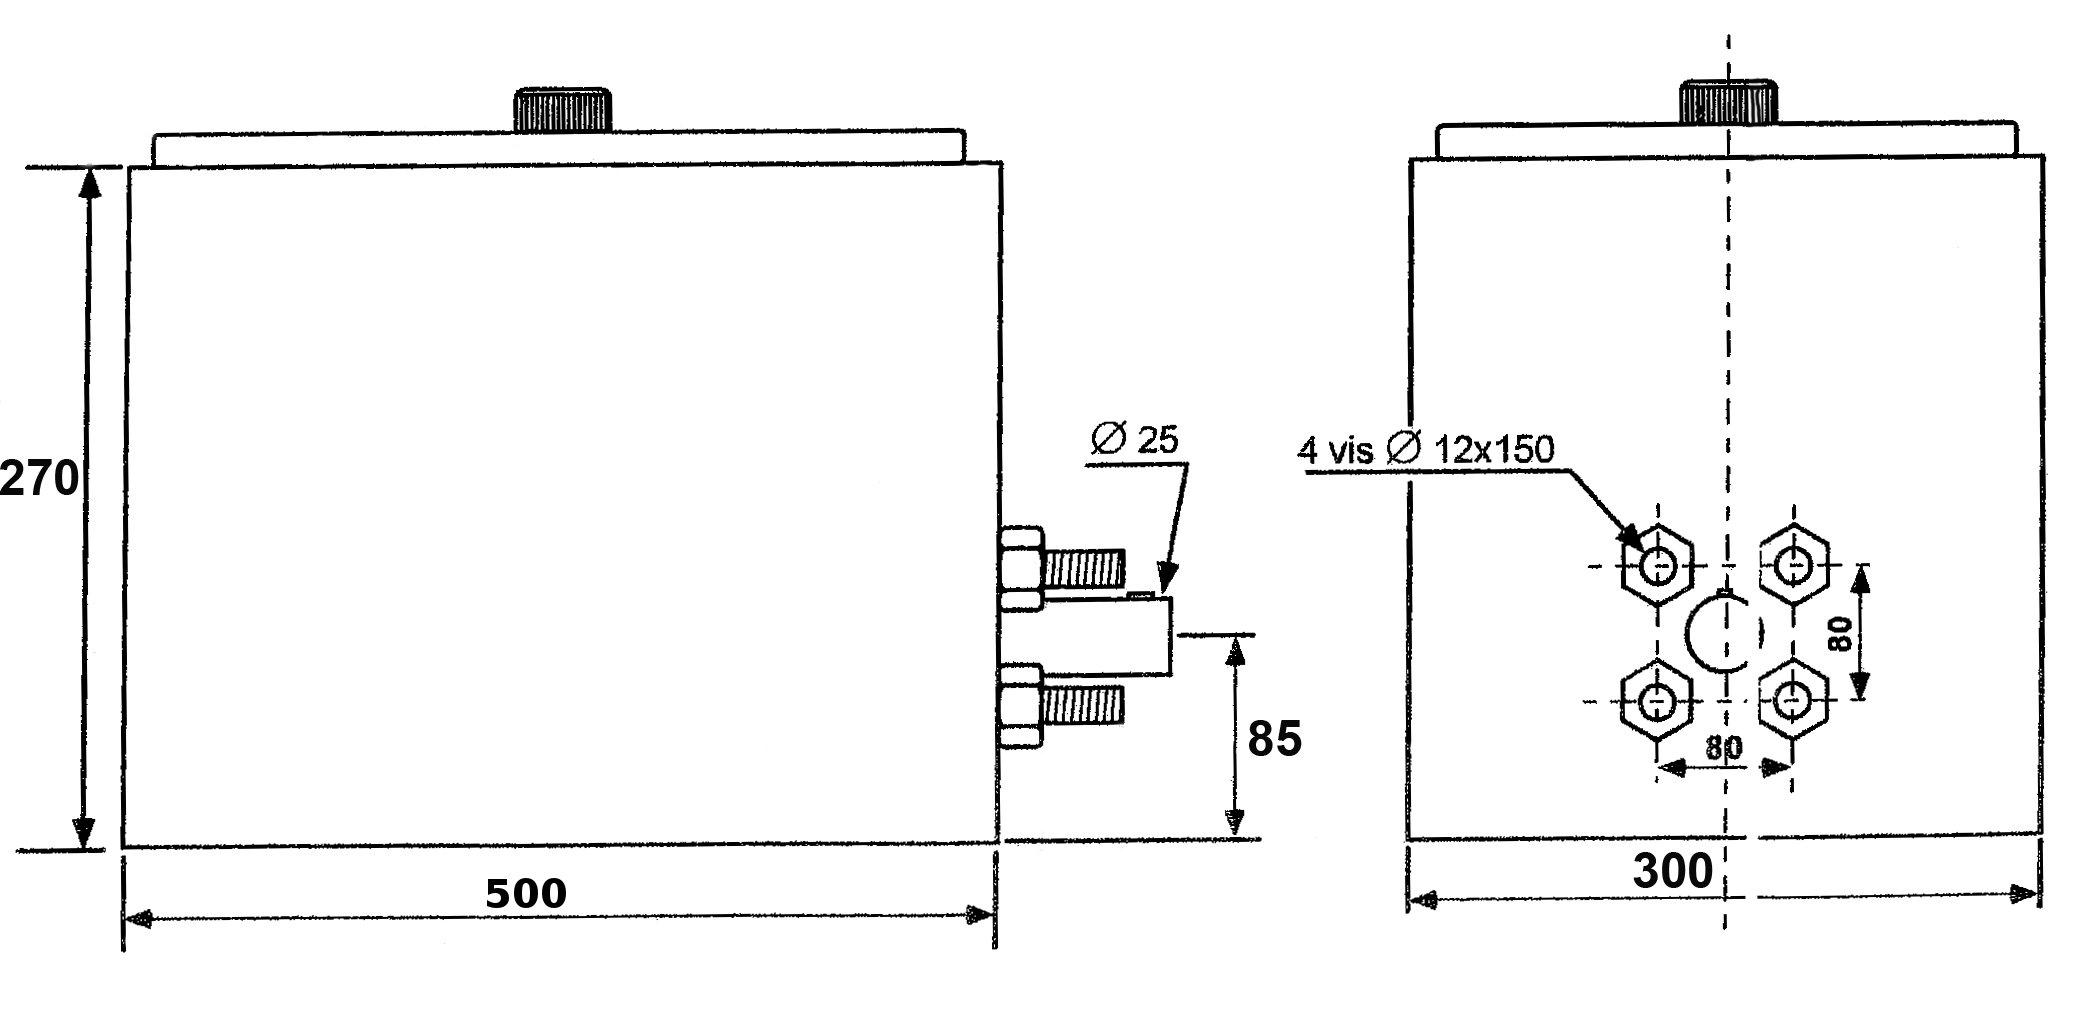 Schéma compresseur de bennage 10 a 16 T